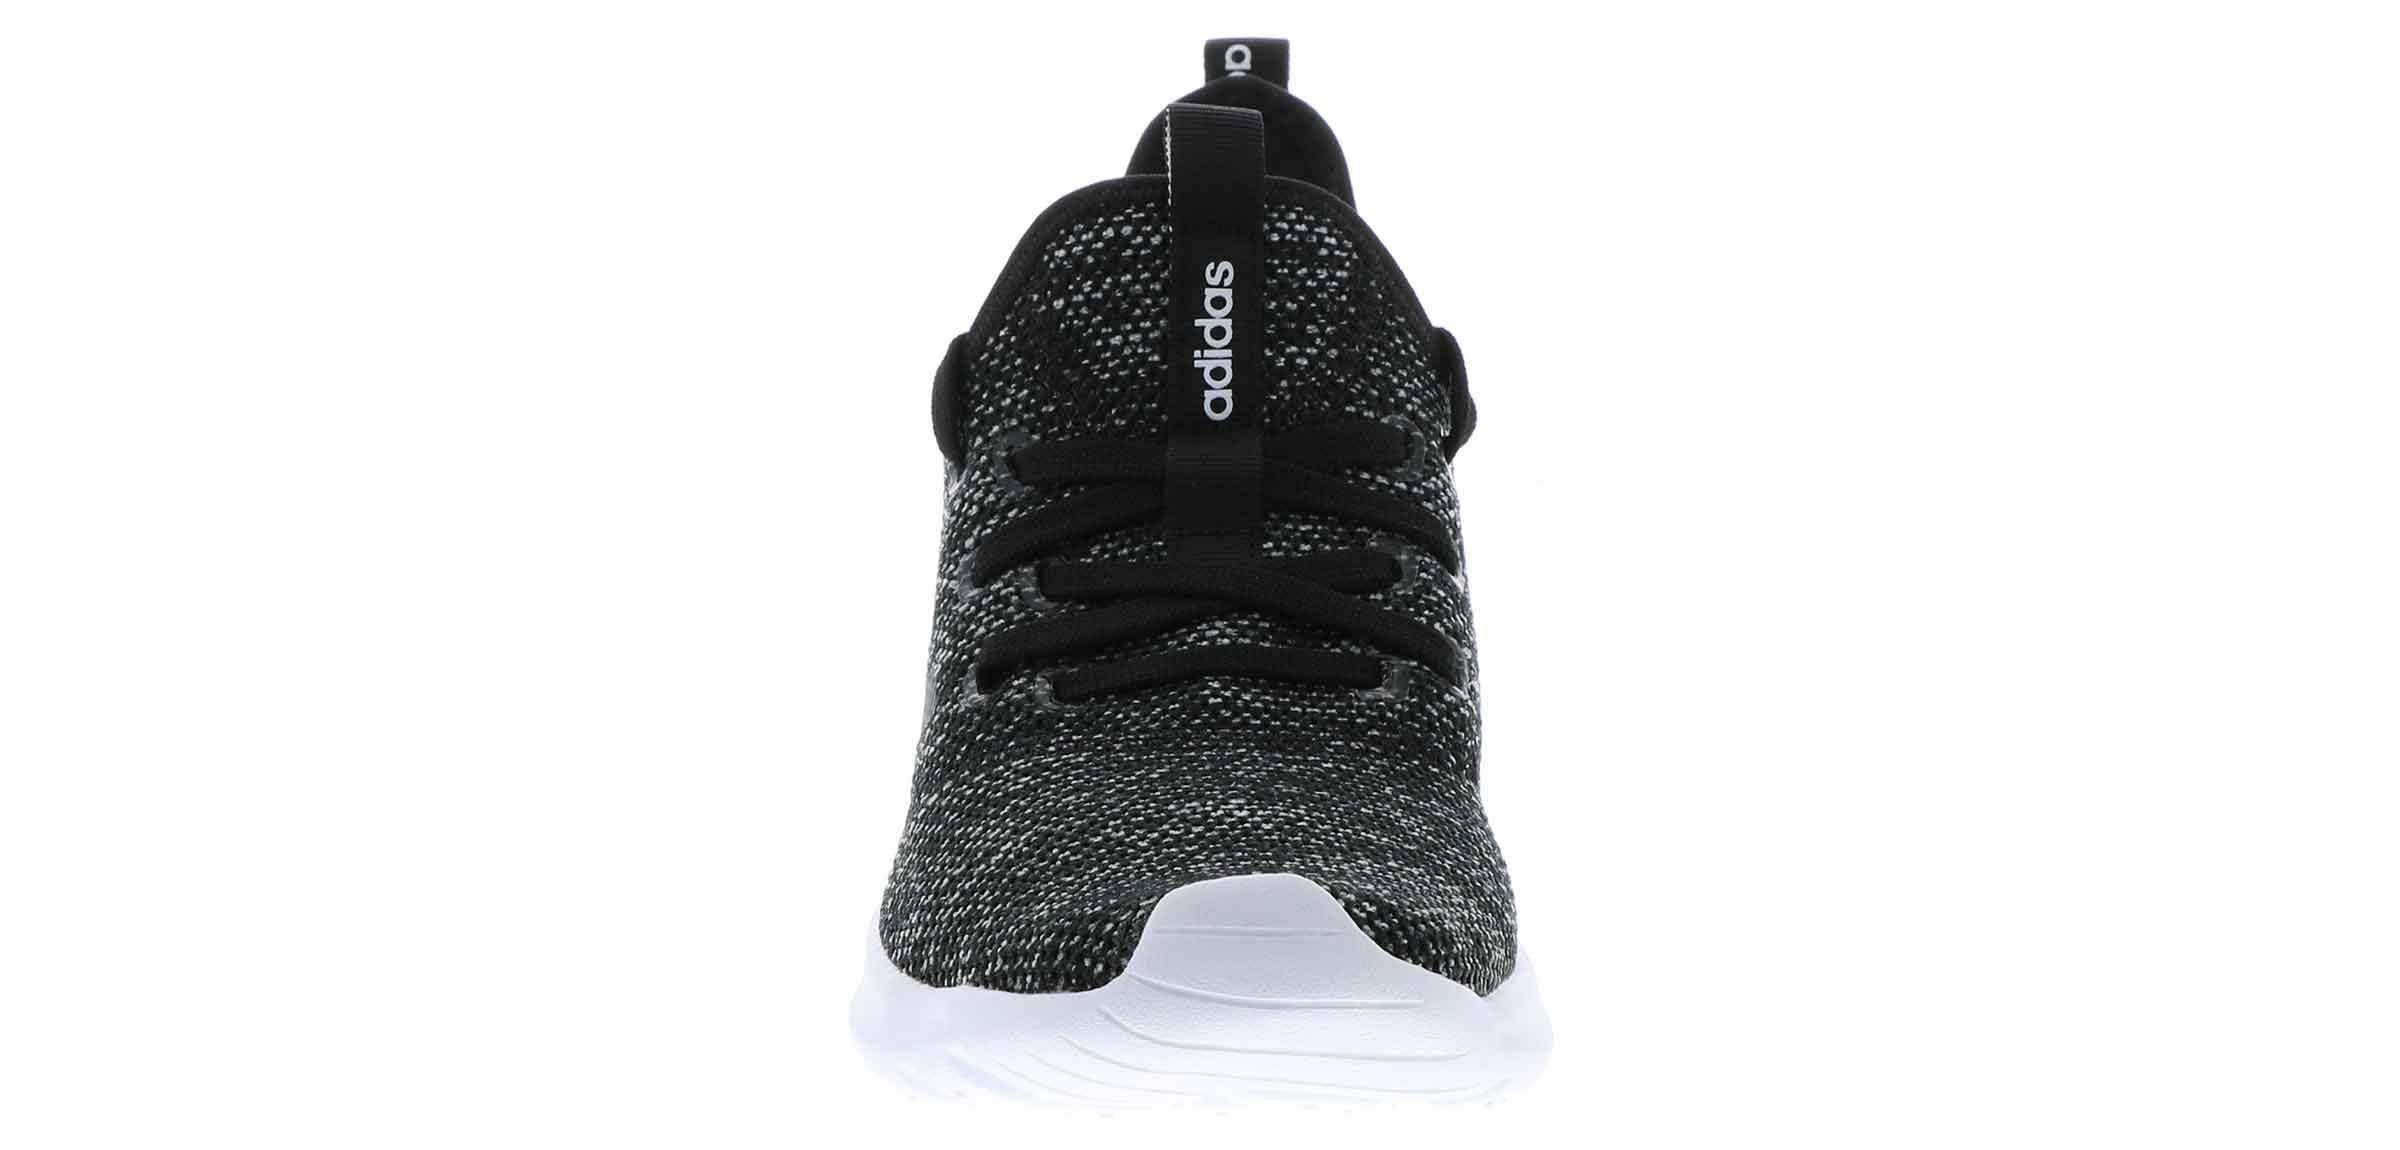 Cloud white Shoes Pure Core White Black 6 Adidas Women's Black Cloudfoam black YqxpgWwEP